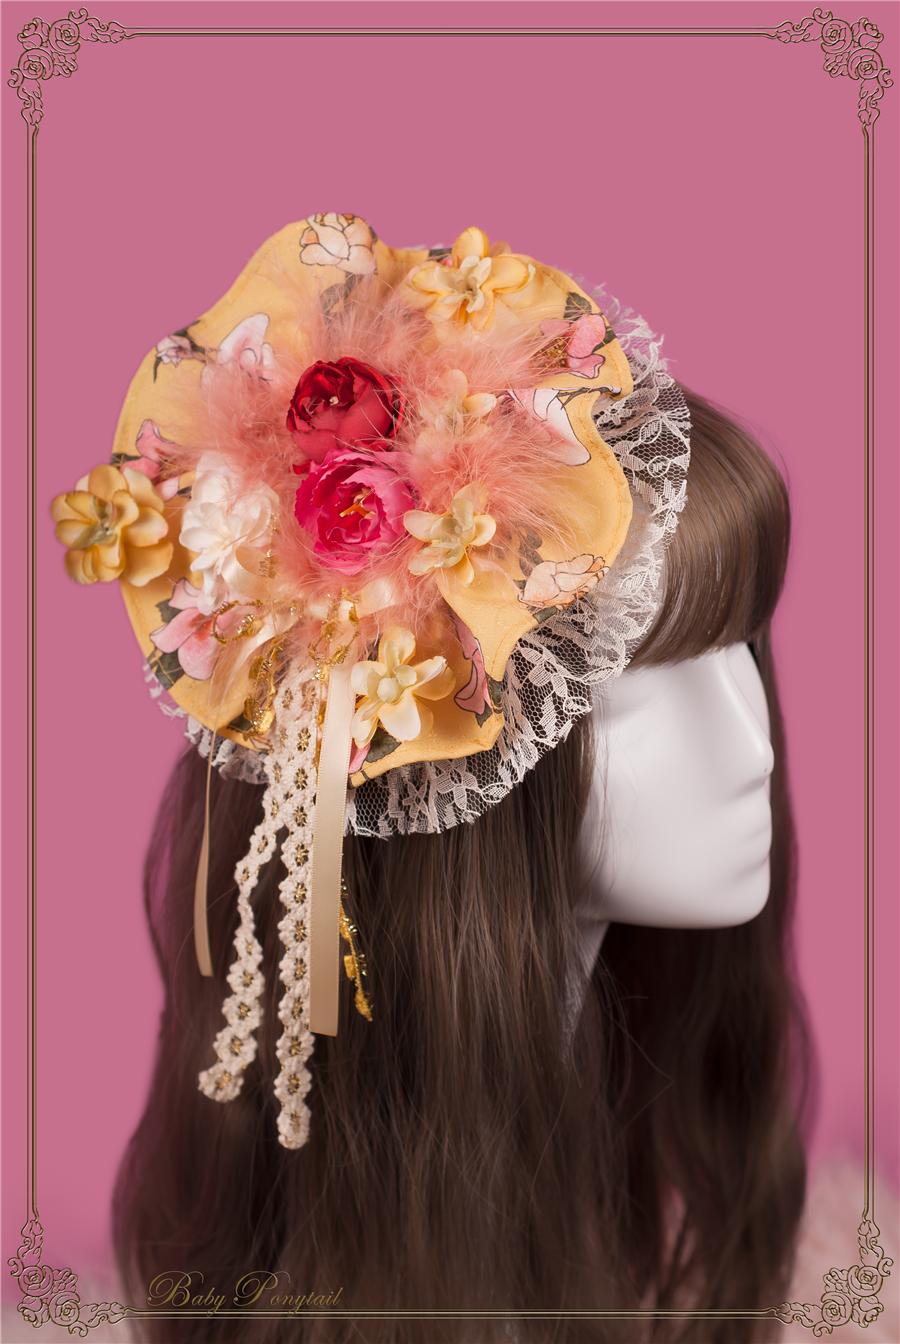 Babyponytail_Accessory_Flower Head Dress_1.jpg